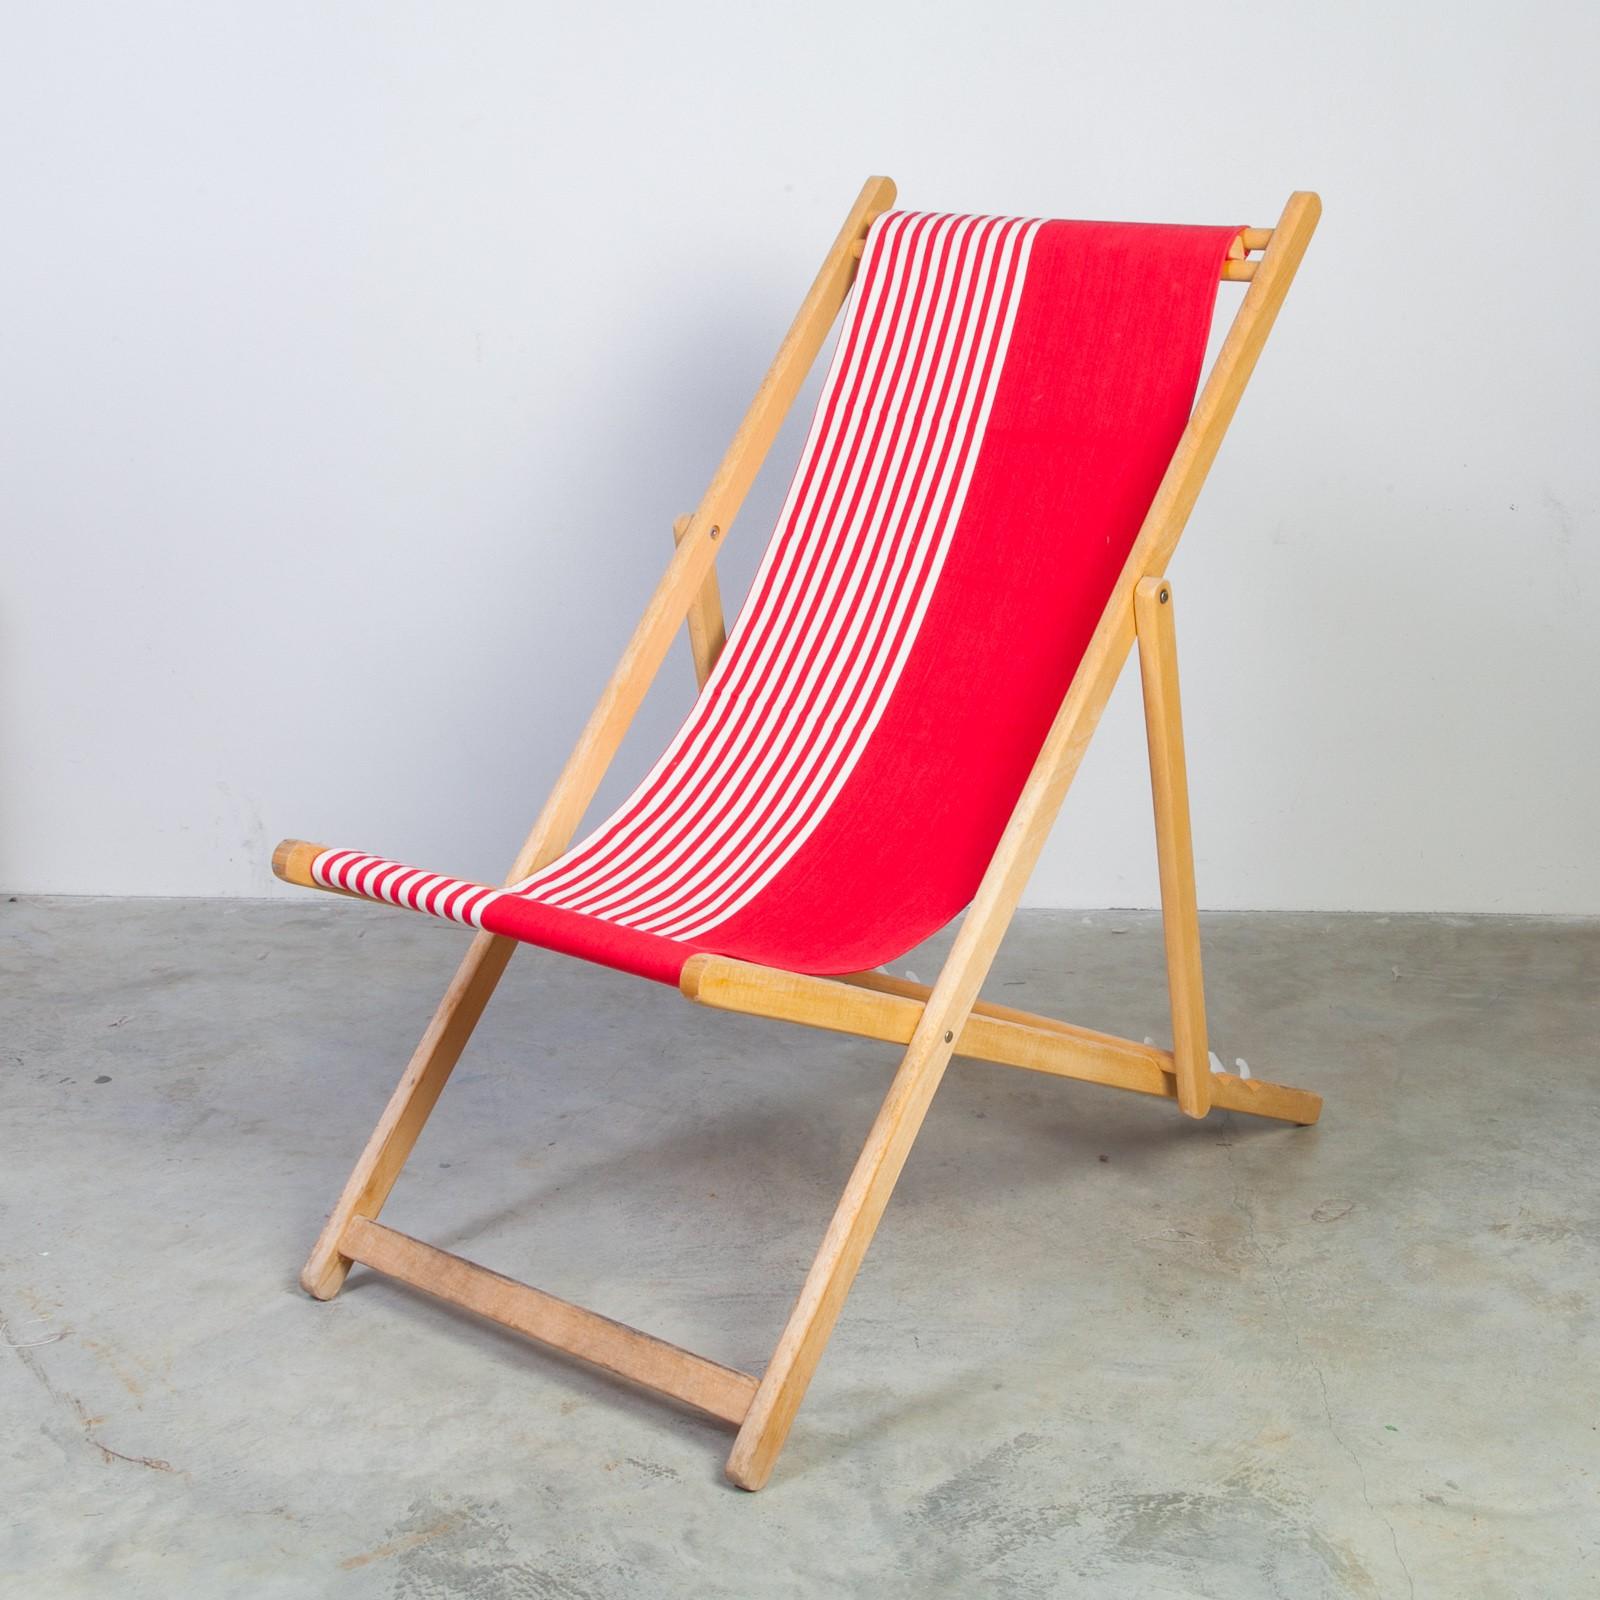 transat en toile good transat en toile with transat en toile gallery of transat de jardin. Black Bedroom Furniture Sets. Home Design Ideas